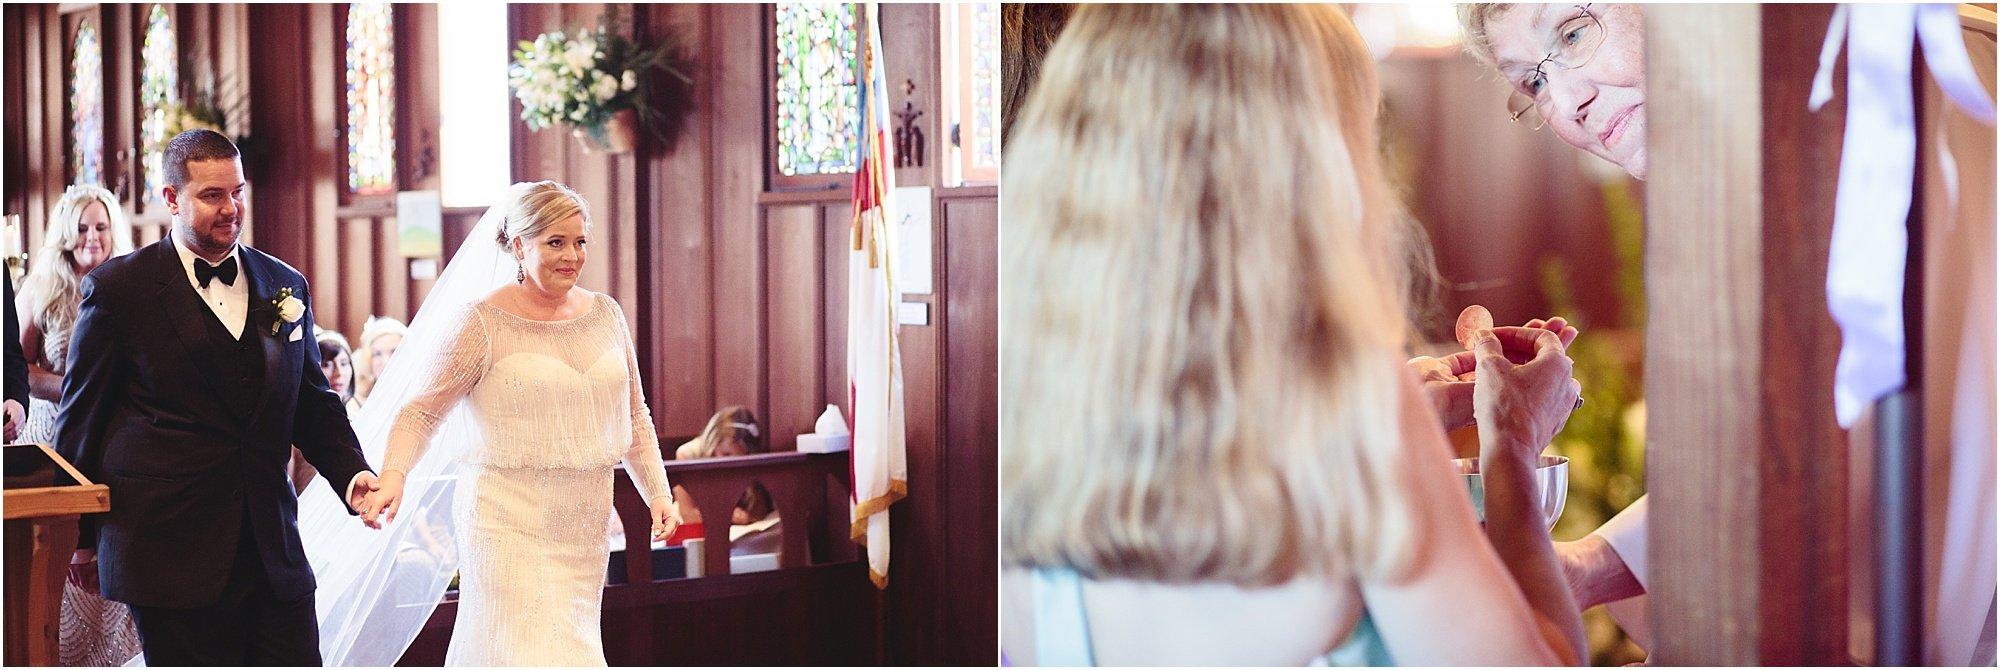 San Diego St. Peter's Church Wedding